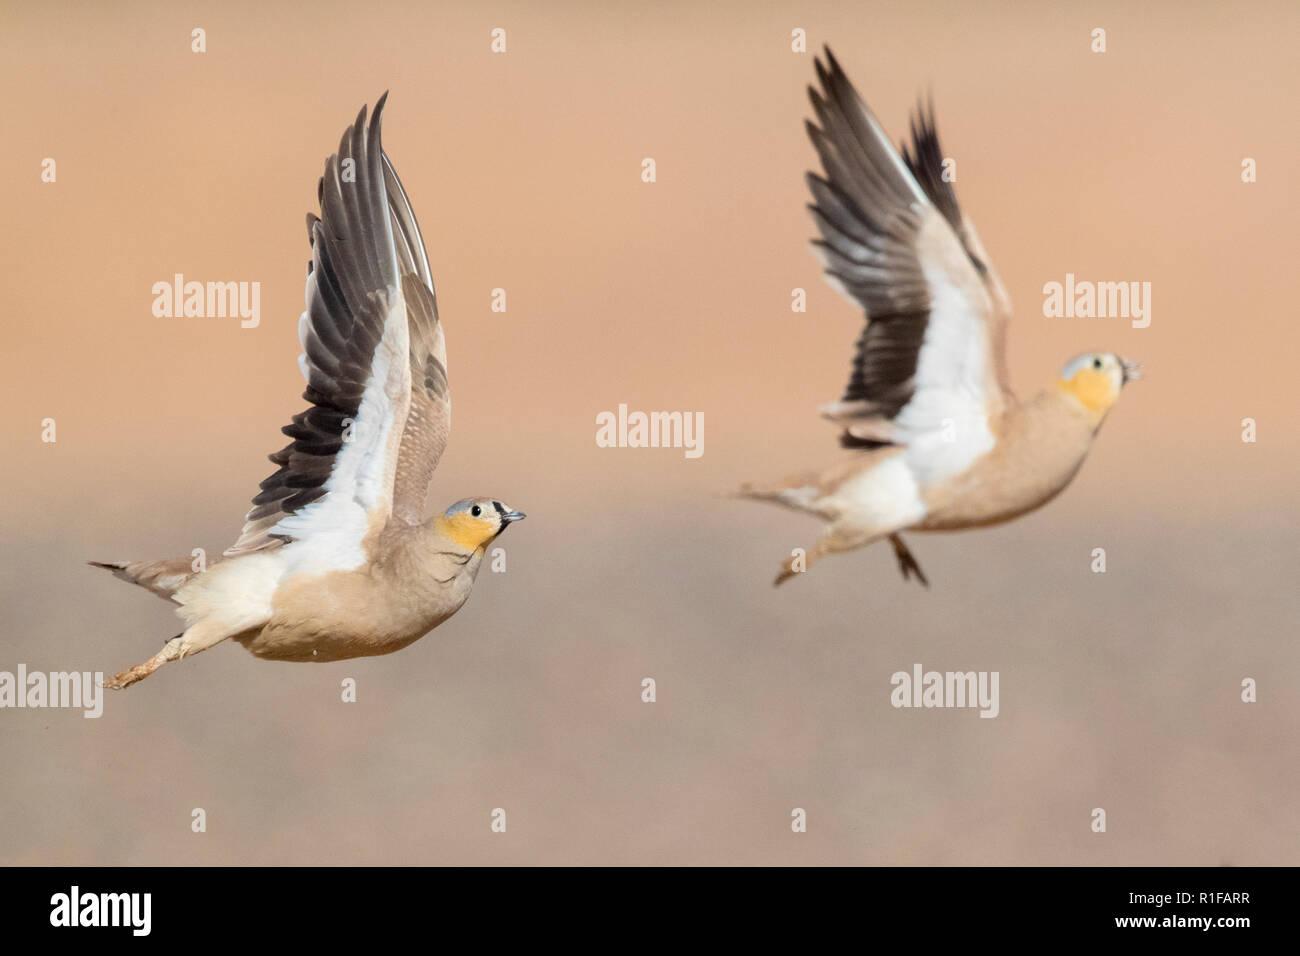 Gekrönt Sandgrouse (Pterocles coronatus), zwei erwachsene Männchen im Flug Stockbild